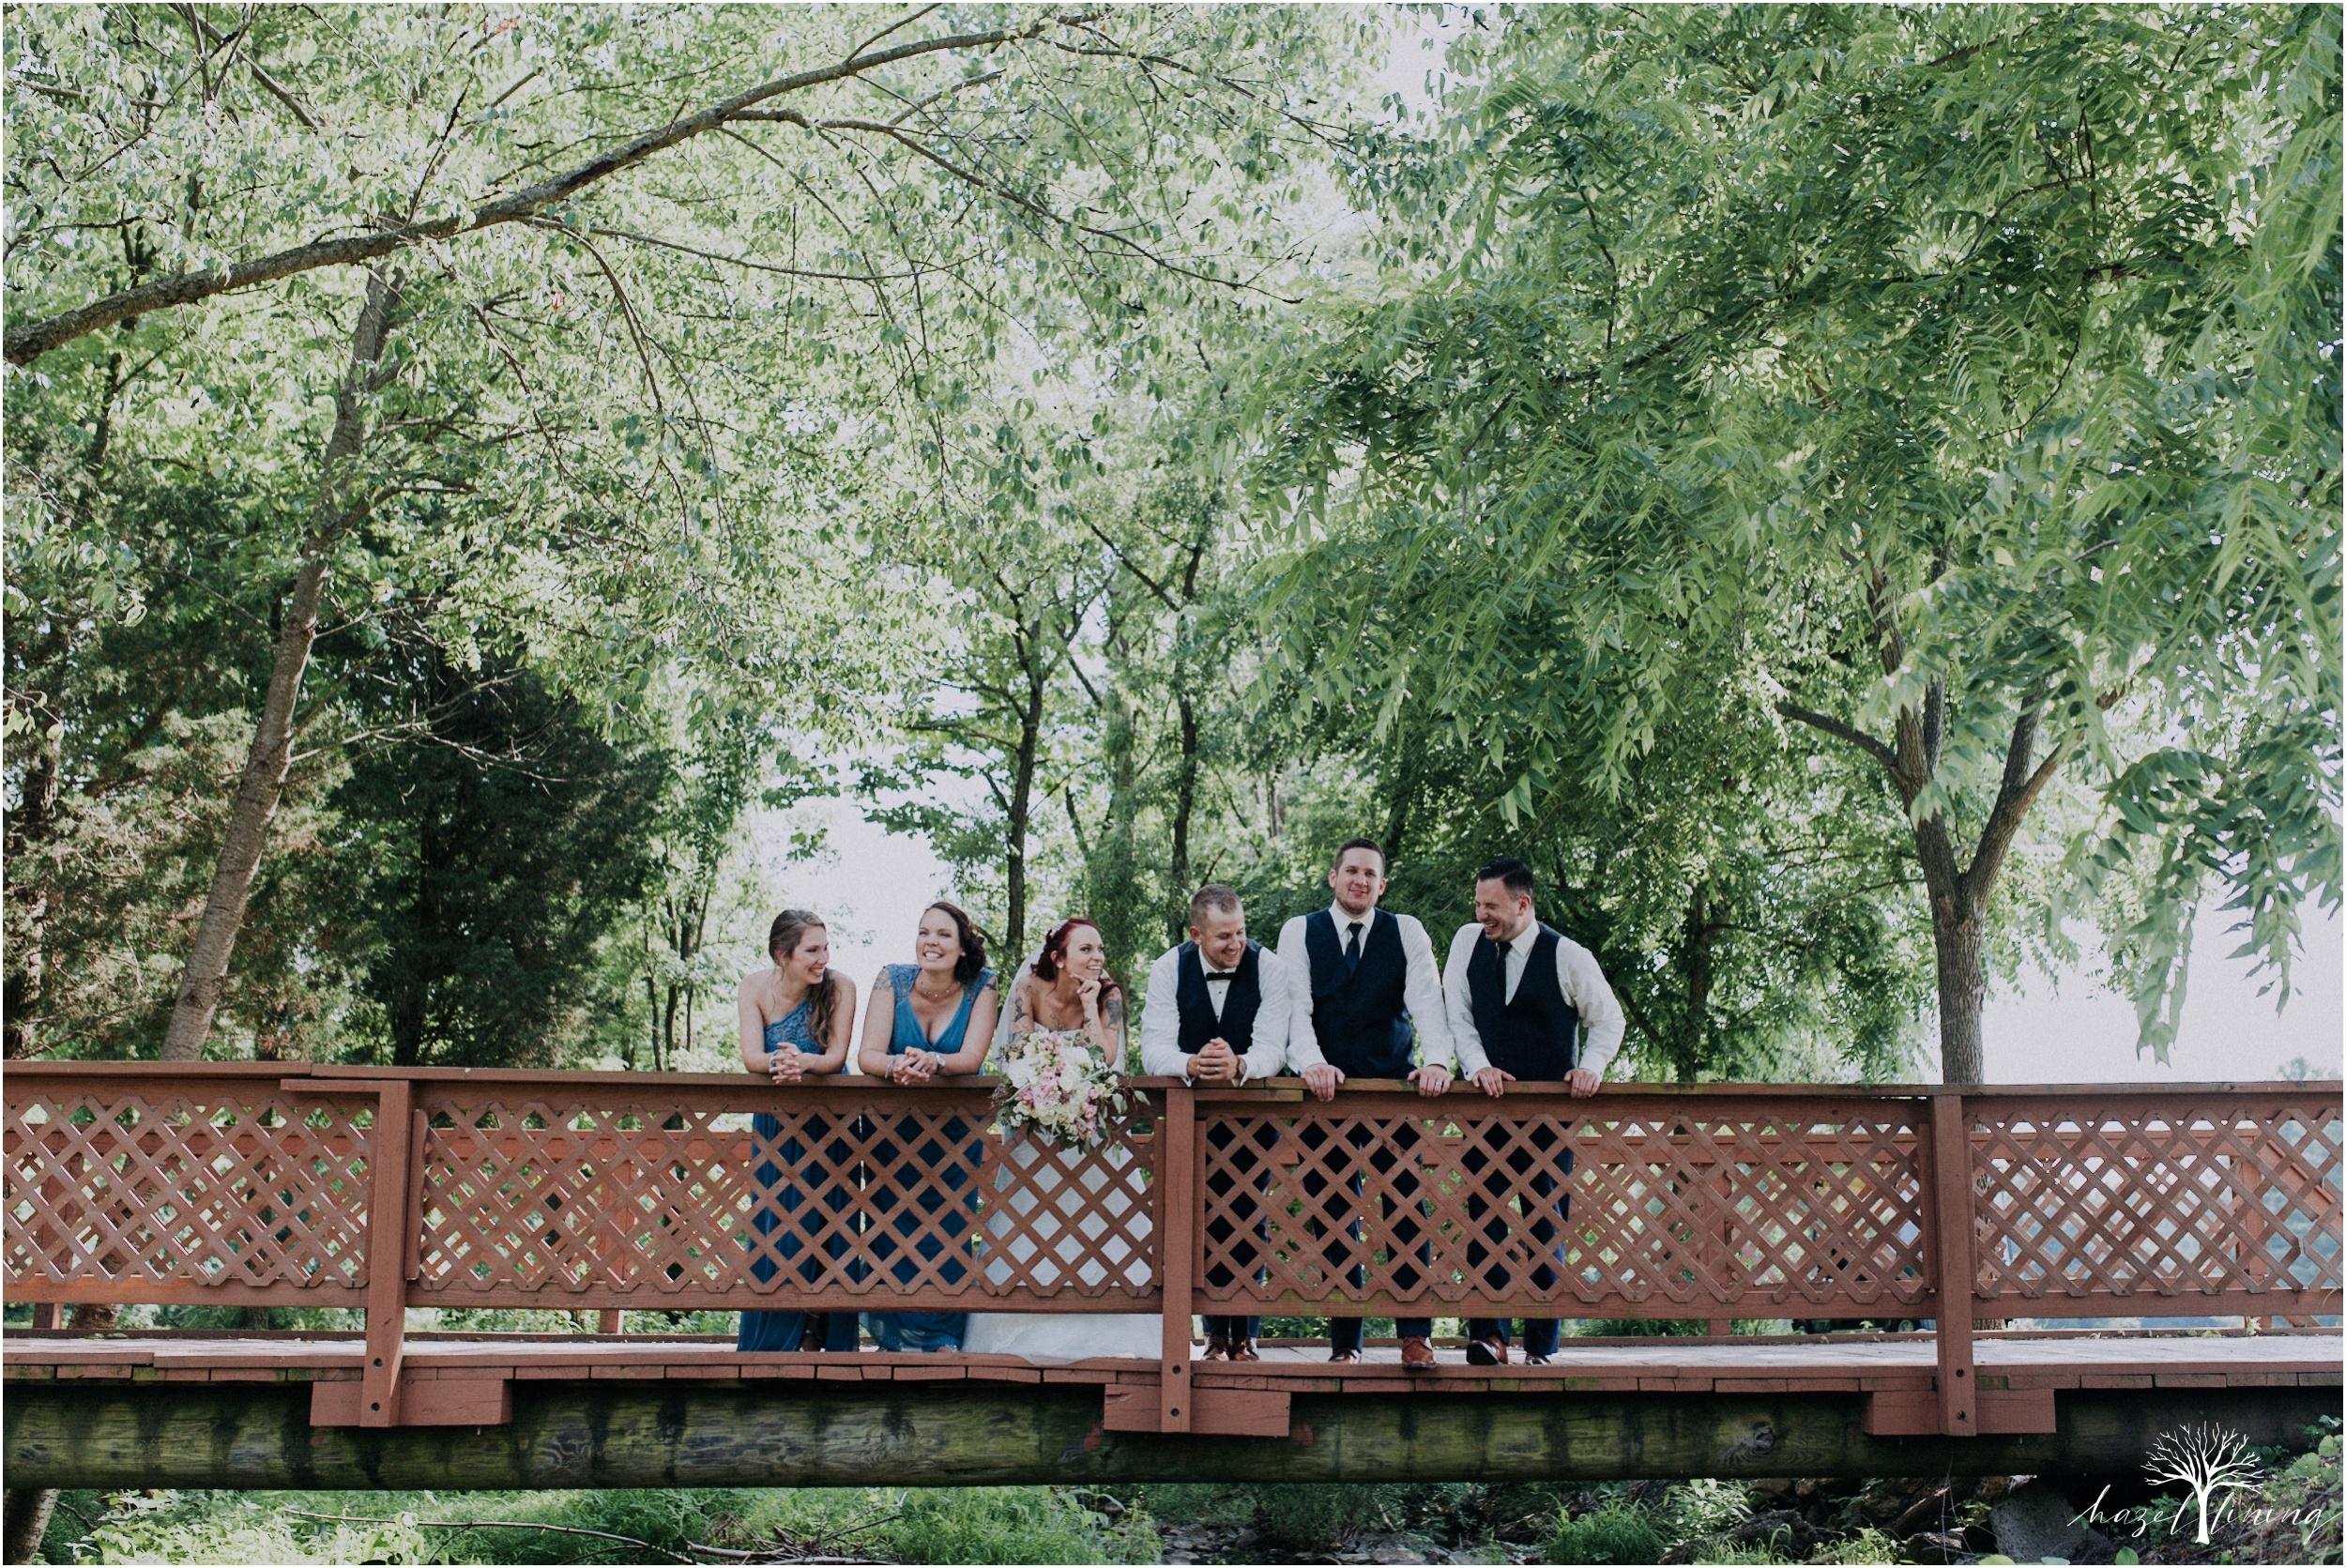 alyssa-james-stiteler-wedding-loft-and-sweet-water-cc-pennsburg-pennsylvania-hazel-lining-travel-wedding-elopement-photography_0078.jpg